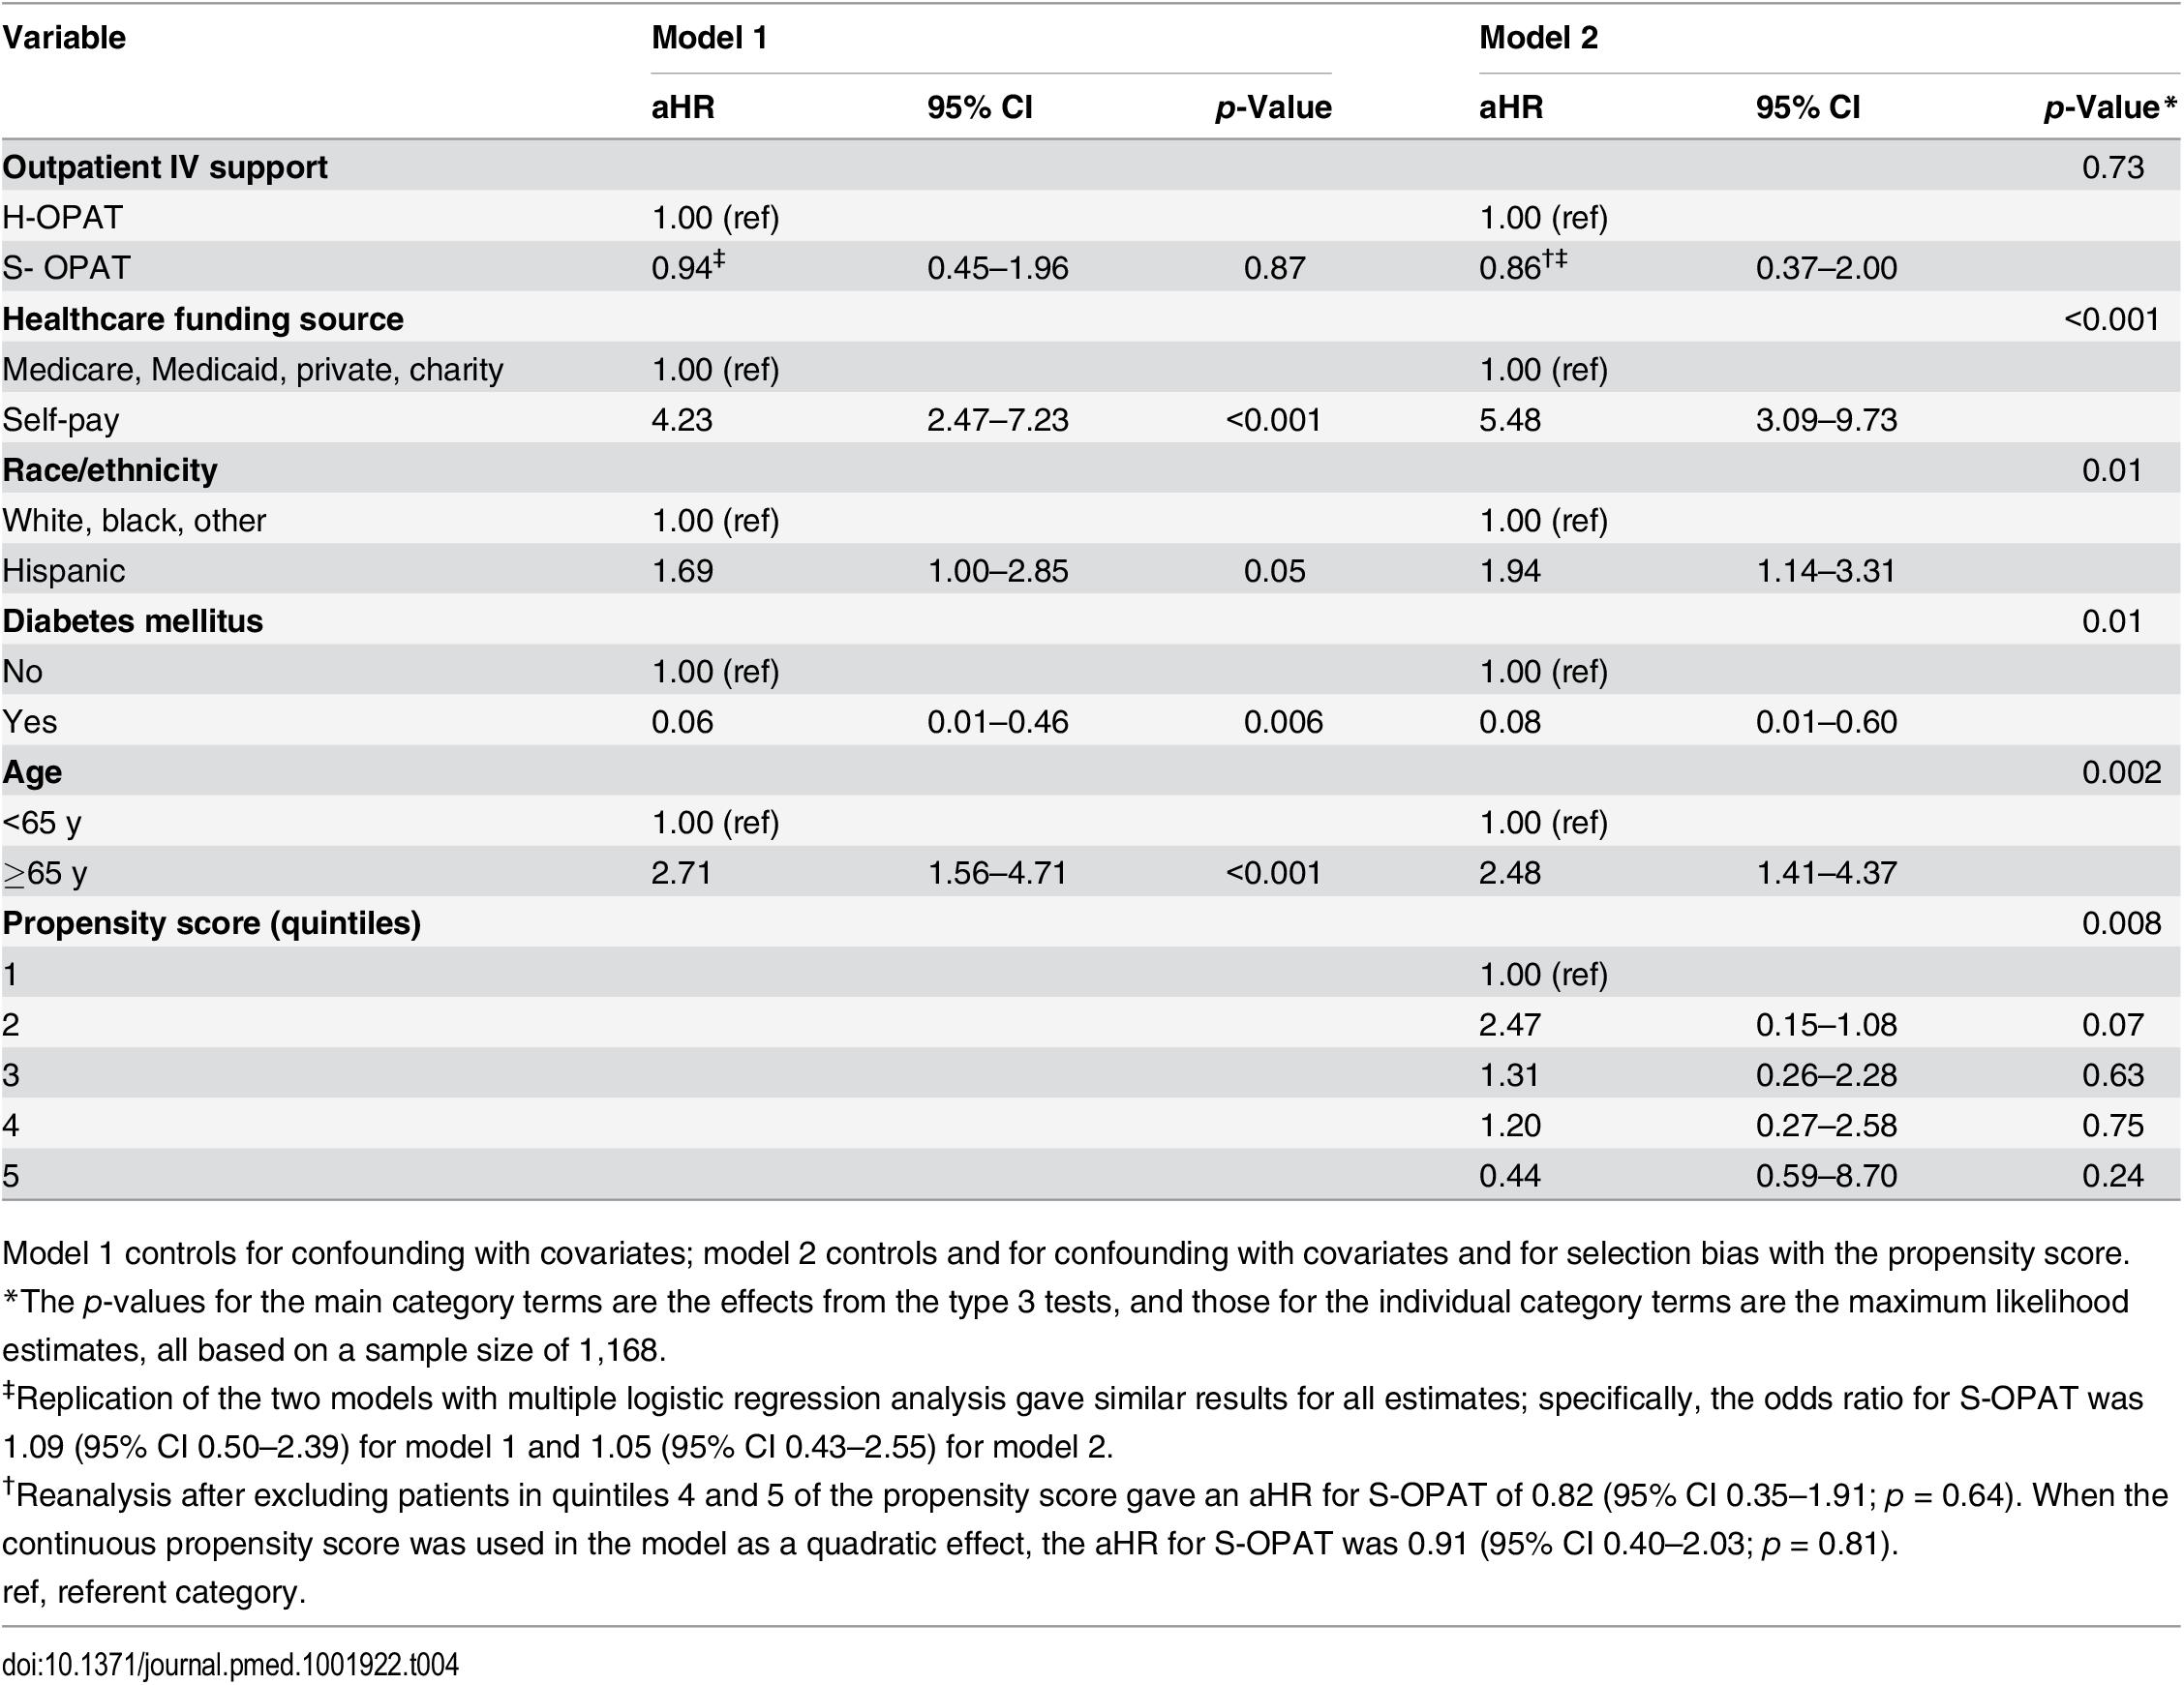 Multivariable proportional hazards regression models of 1-y mortality.